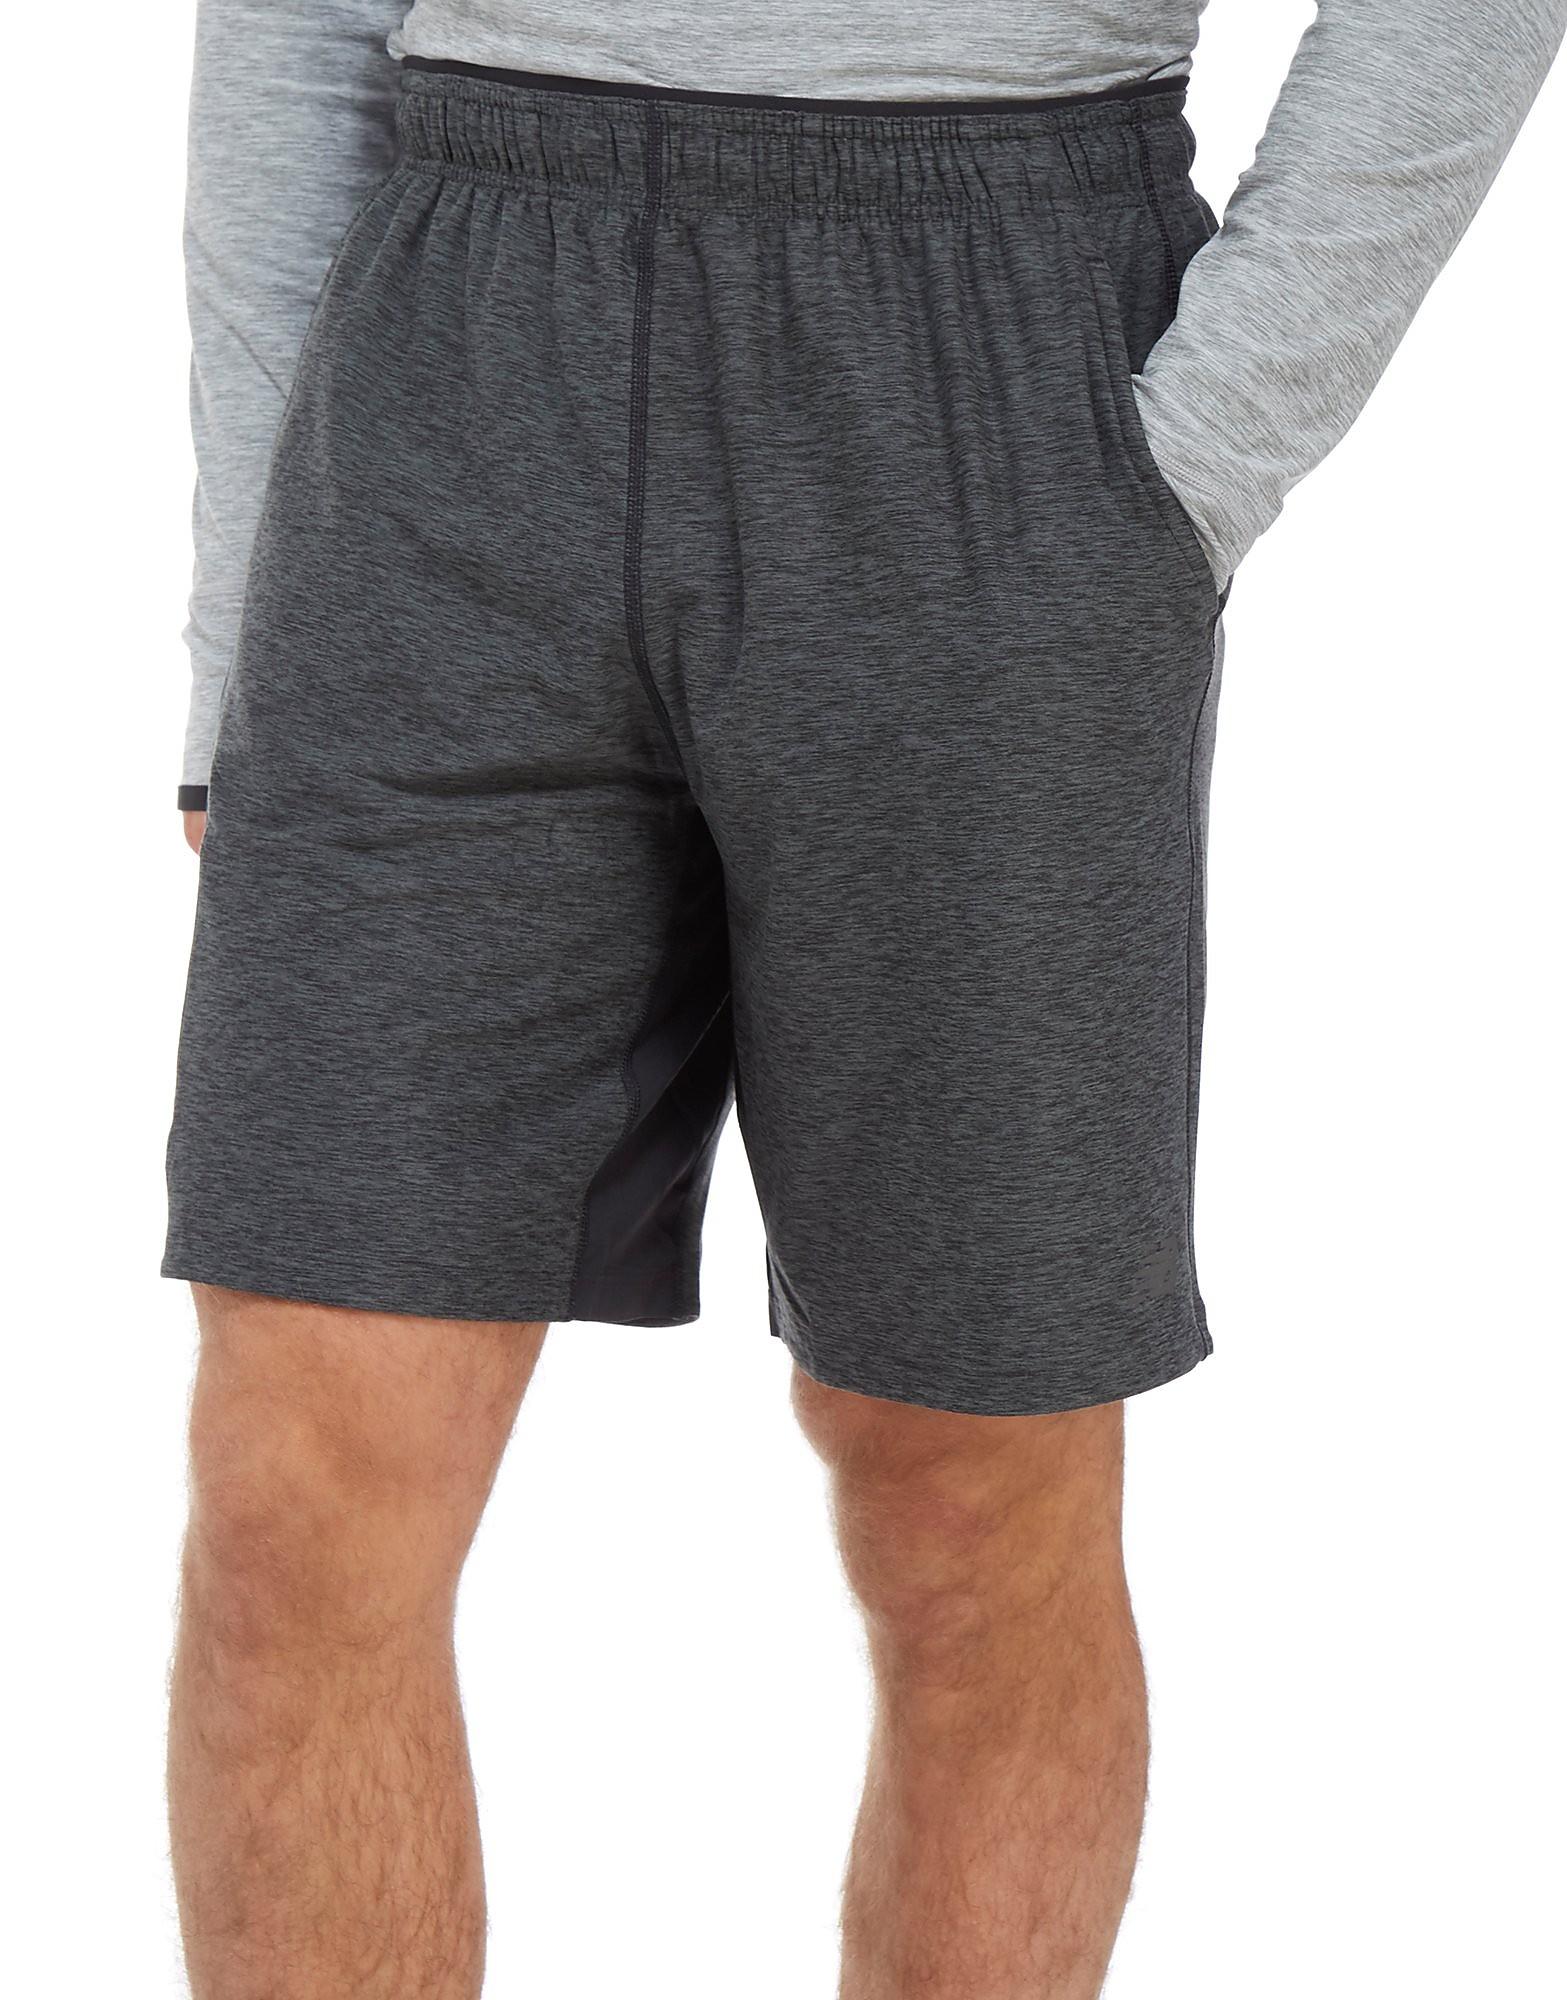 New Balance Anticipate Shorts